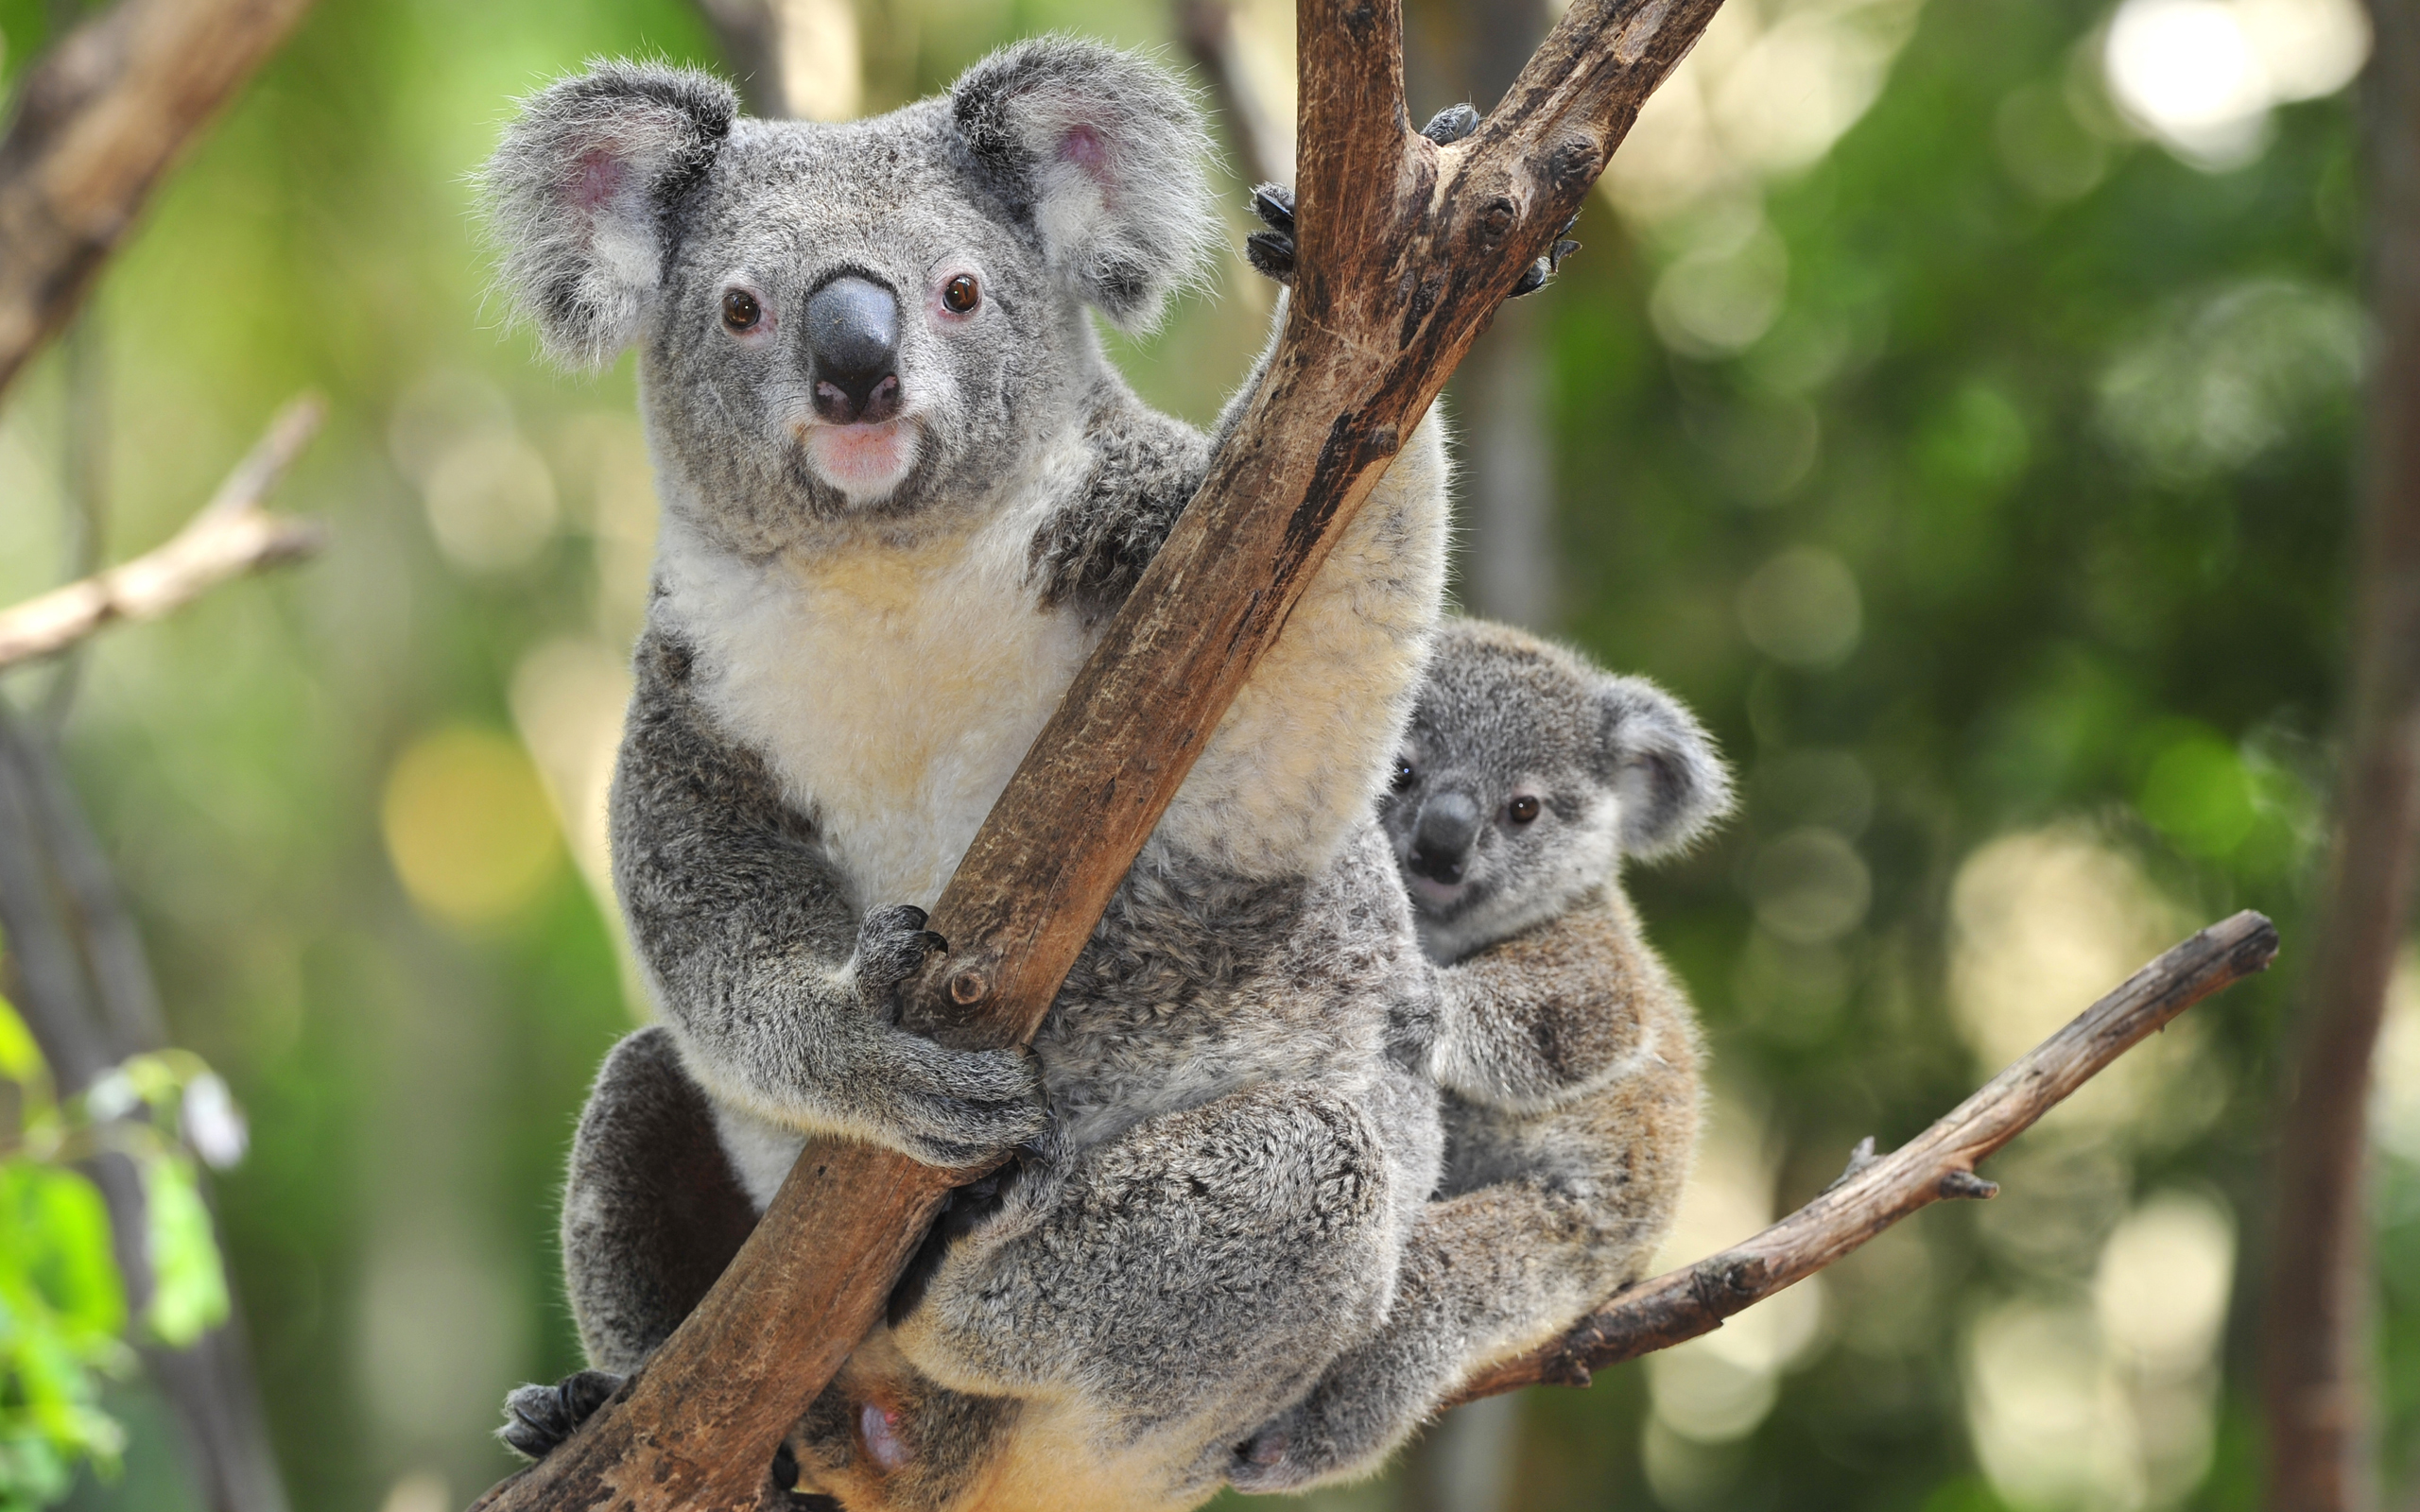 Pics Photos - Cute Koala Hd Wallpaper 150x150 Koala Hd ...